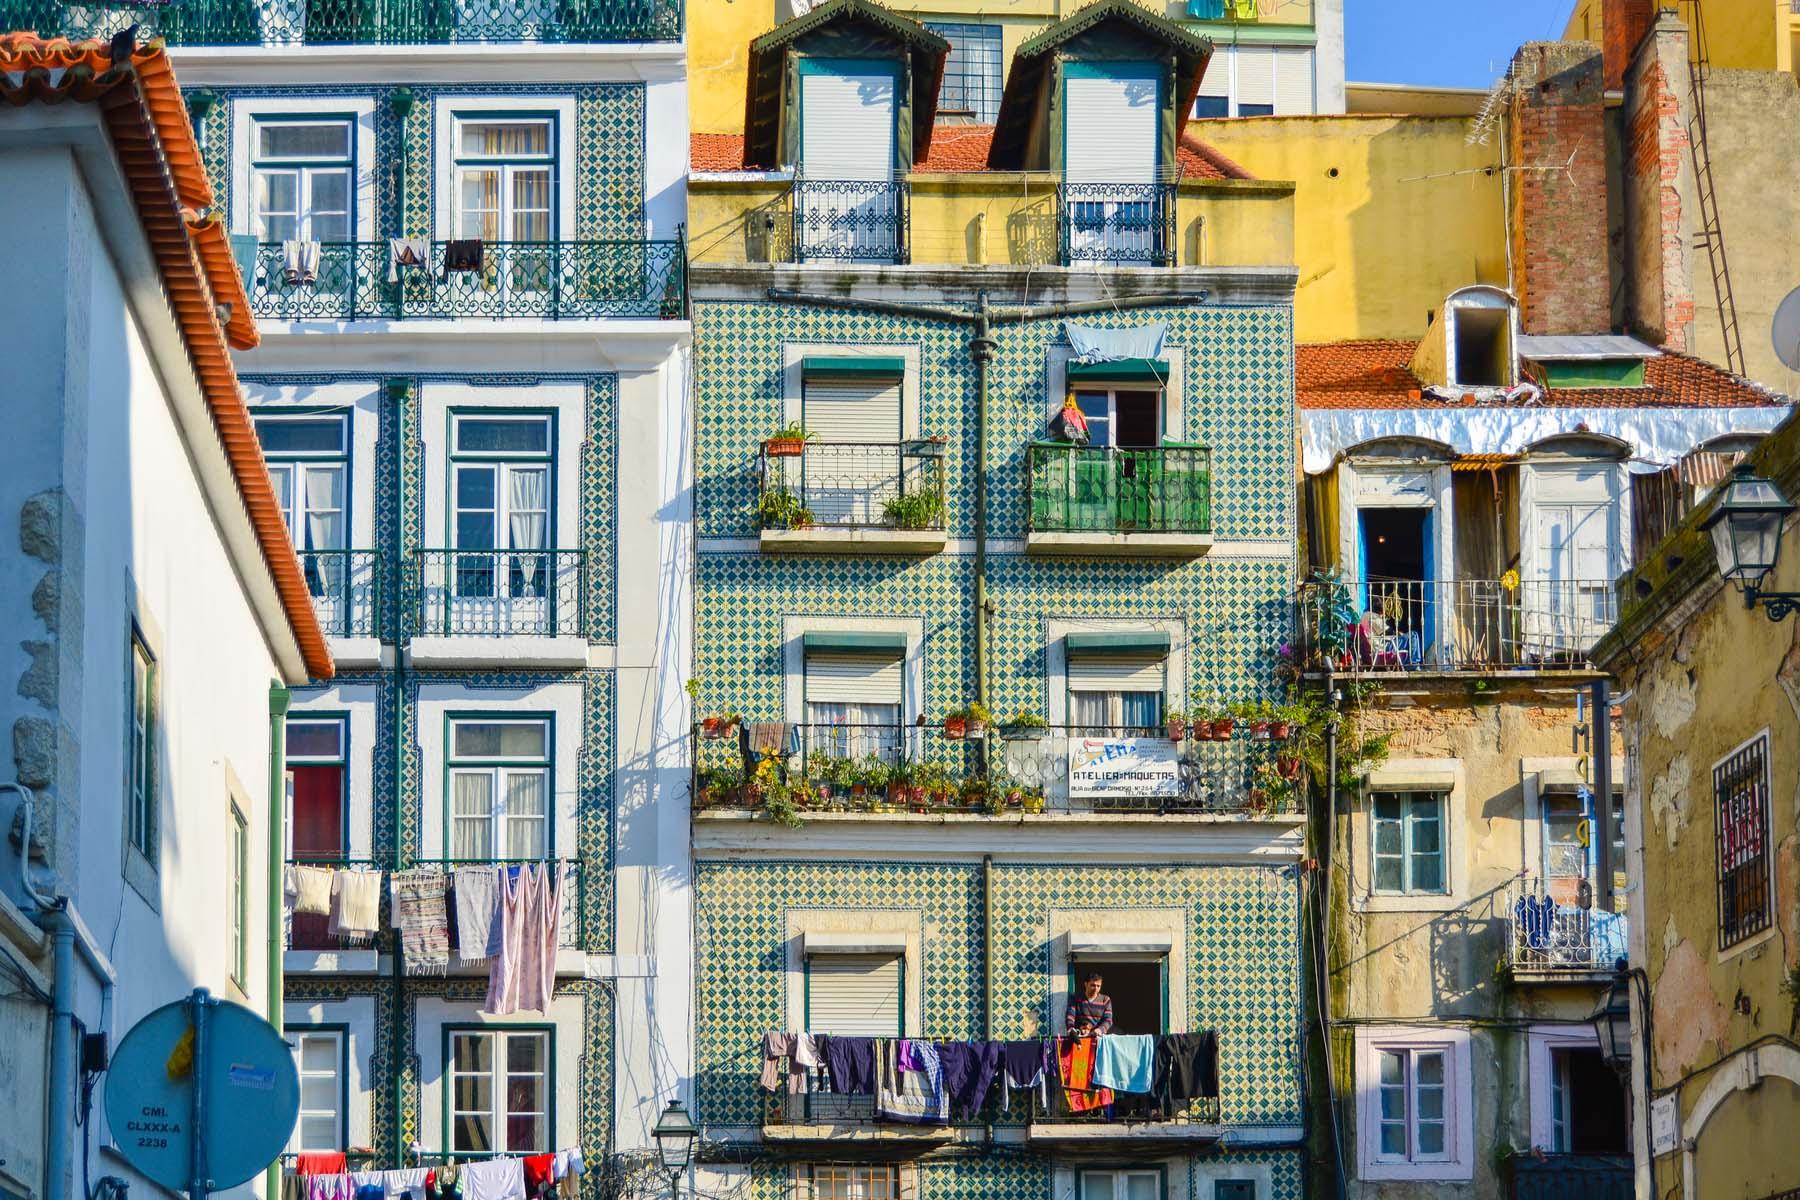 homes in Lisbon